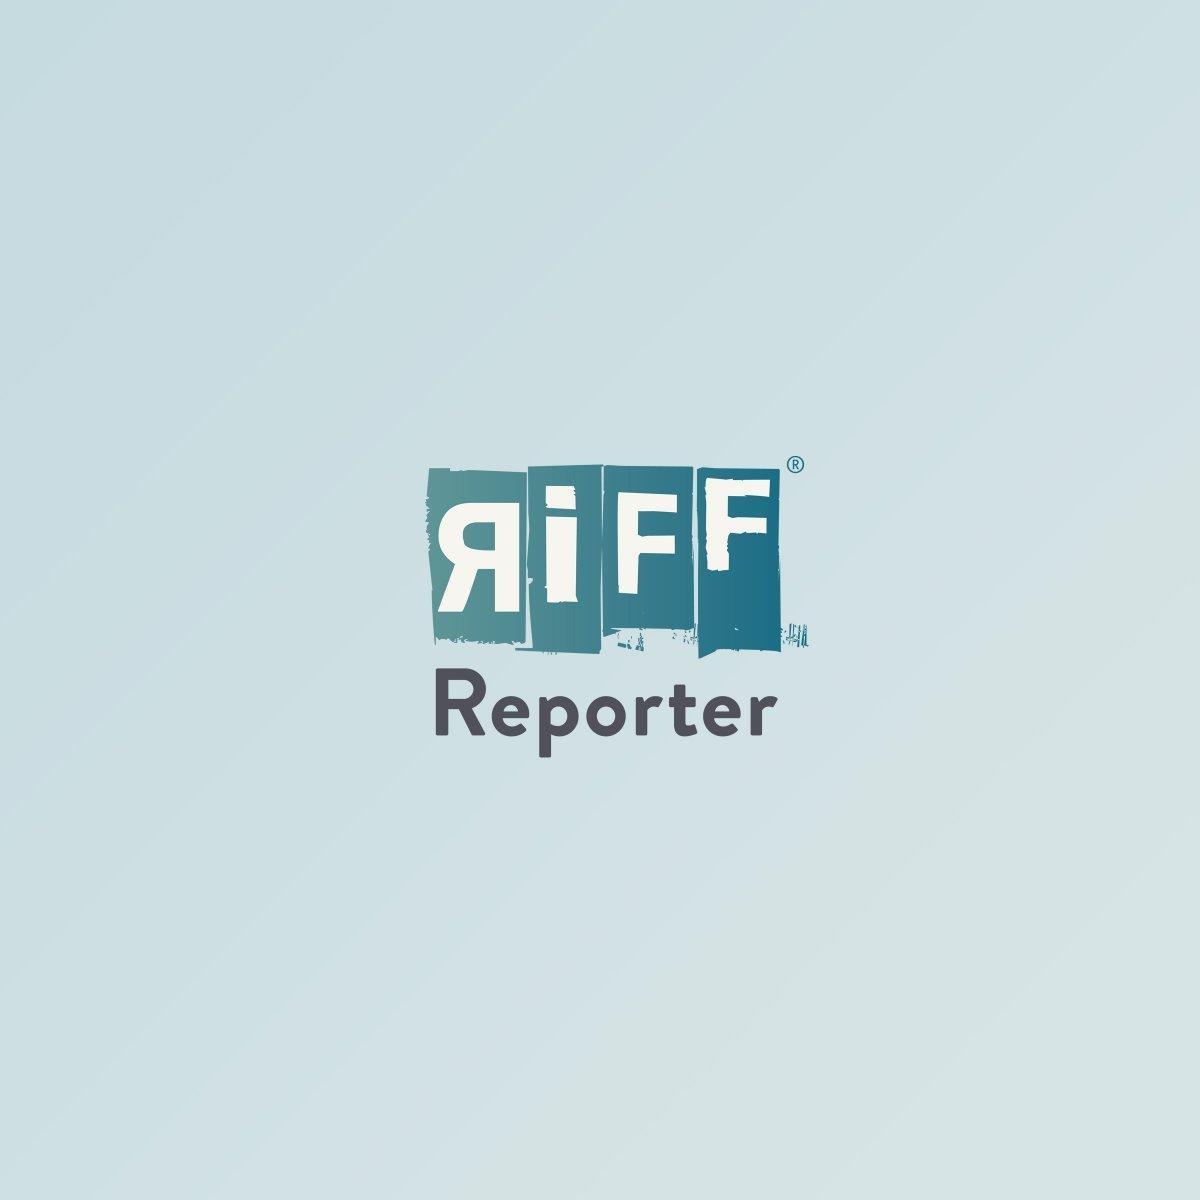 Weltreporter Logo – Illustration mit Weltkugel, Kamera, Mikrofon und Stift